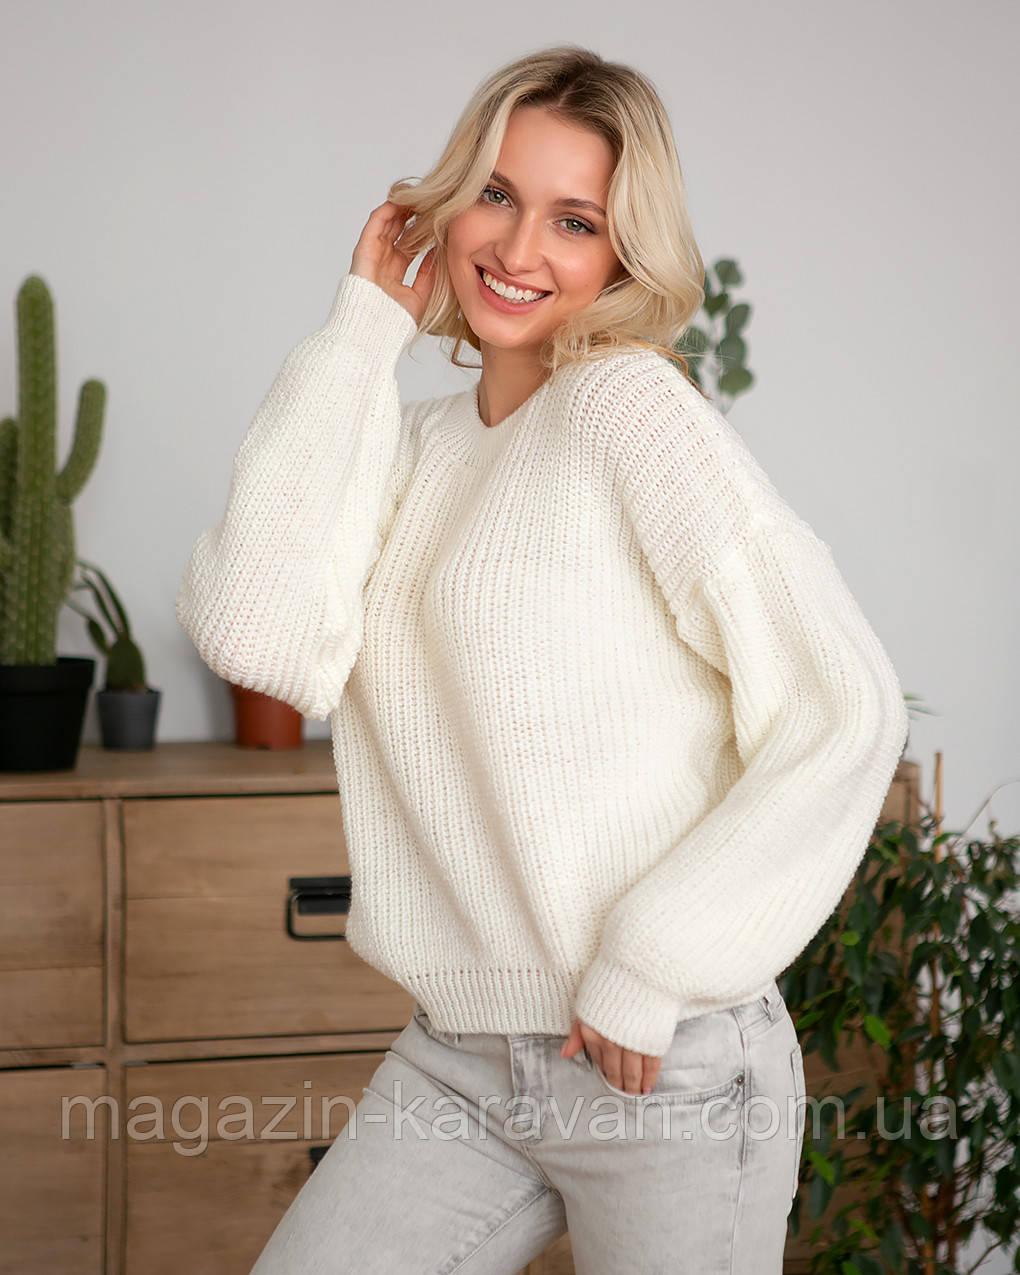 Модный женский свитер (S-M)